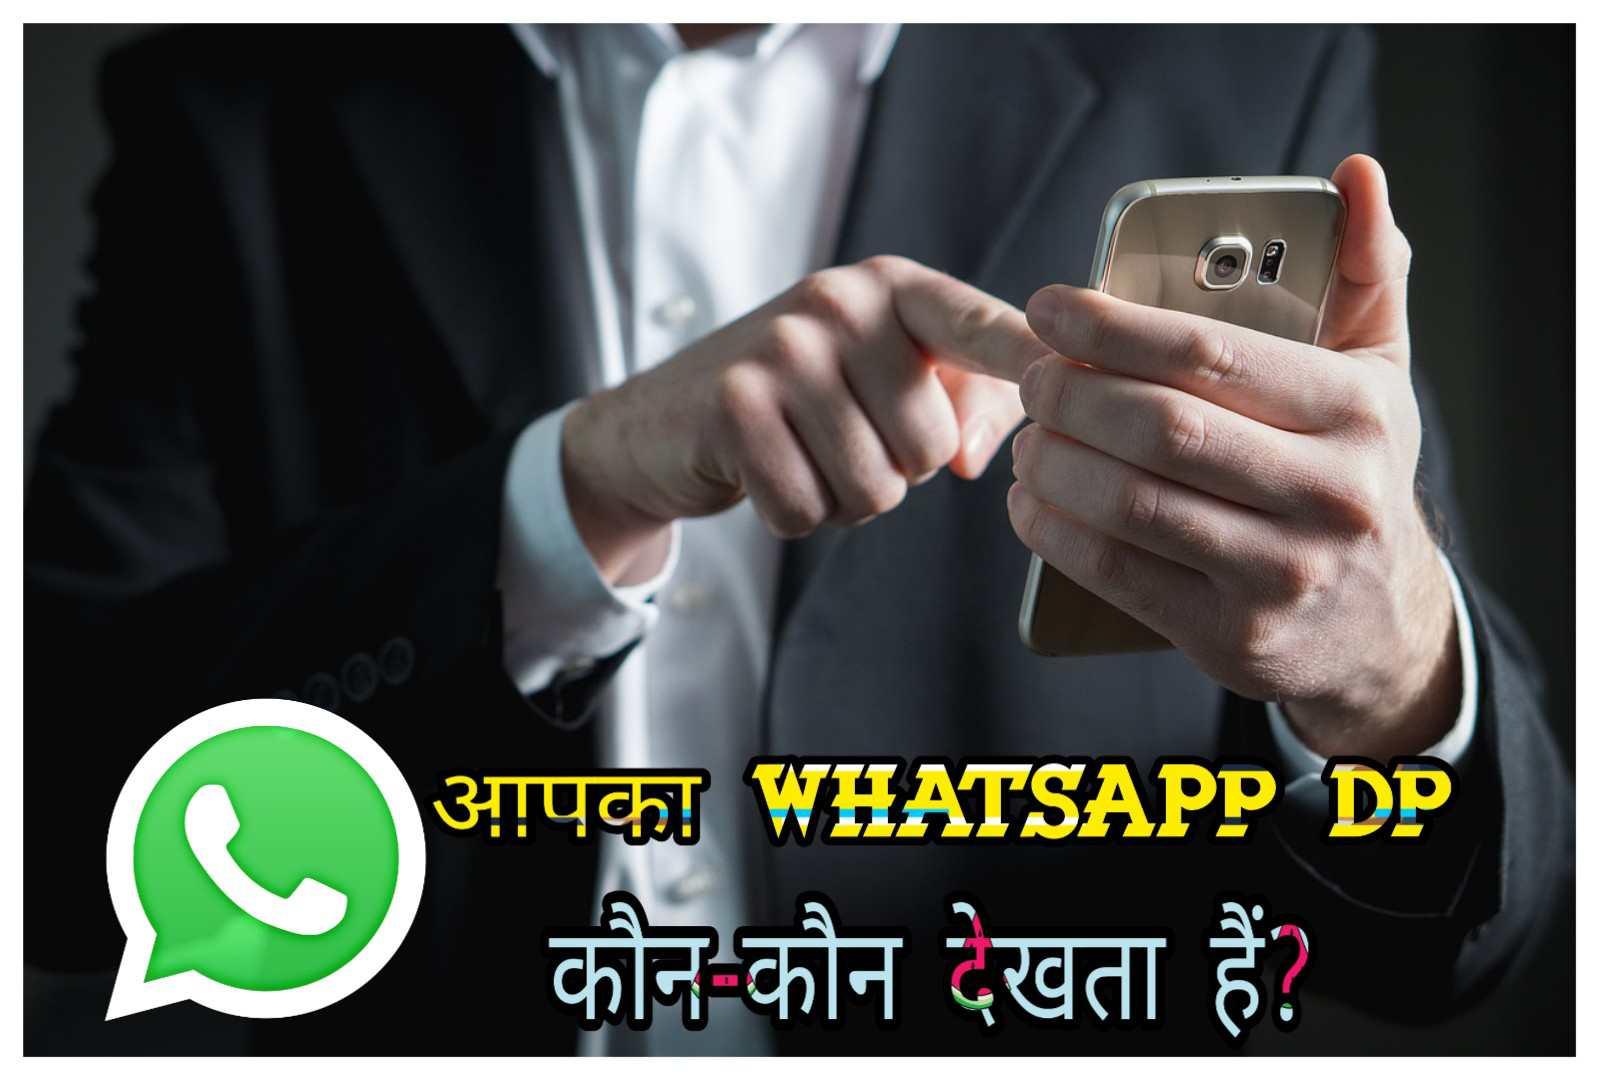 Whatsapp Profile pic kaun dekhta hai PNG Image Hindi technoguru